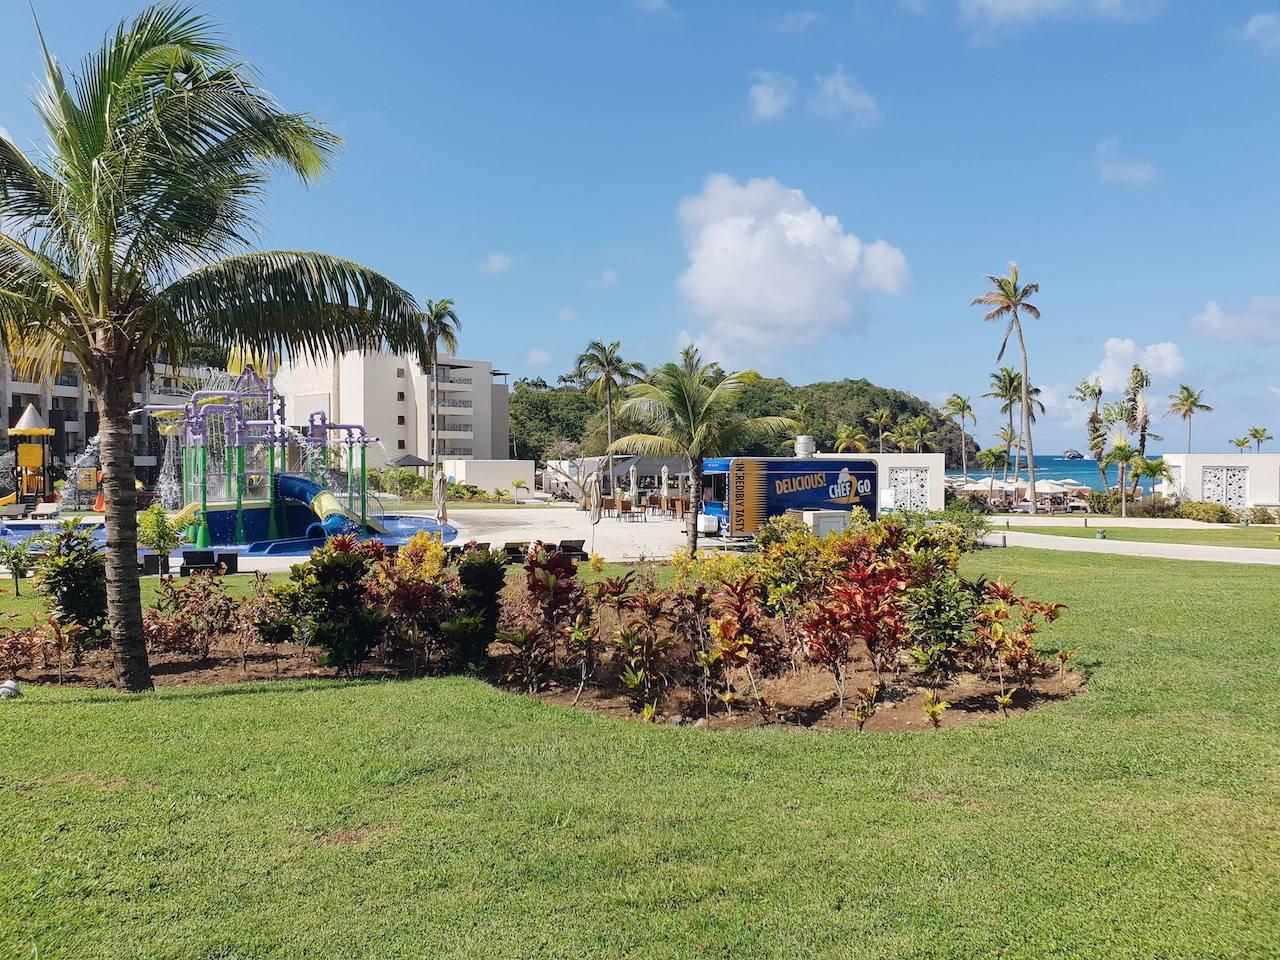 Royalton Saint Lucia hotel grounds